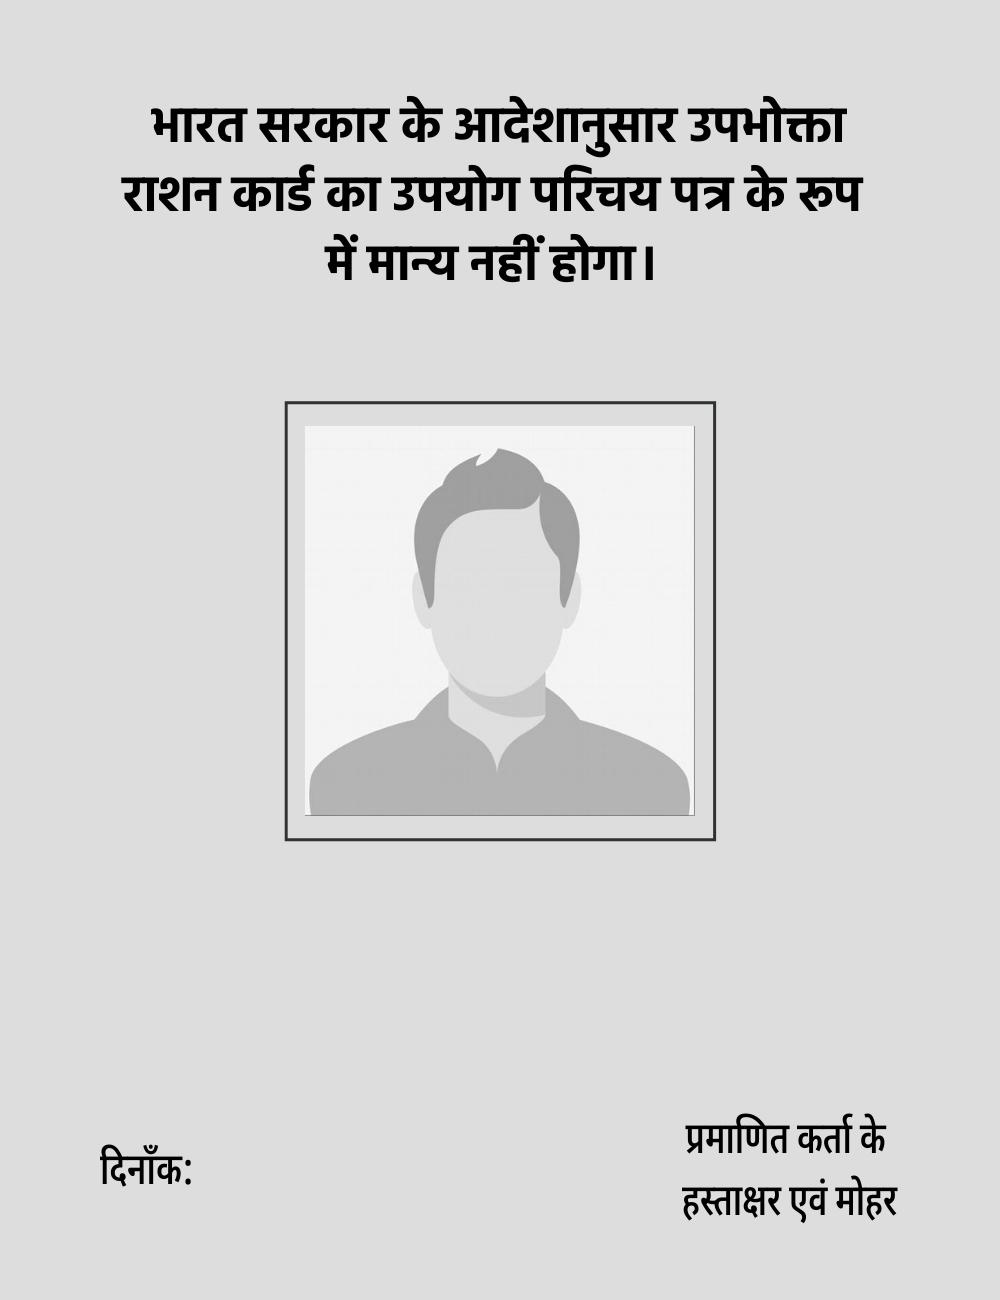 haryana ration card image